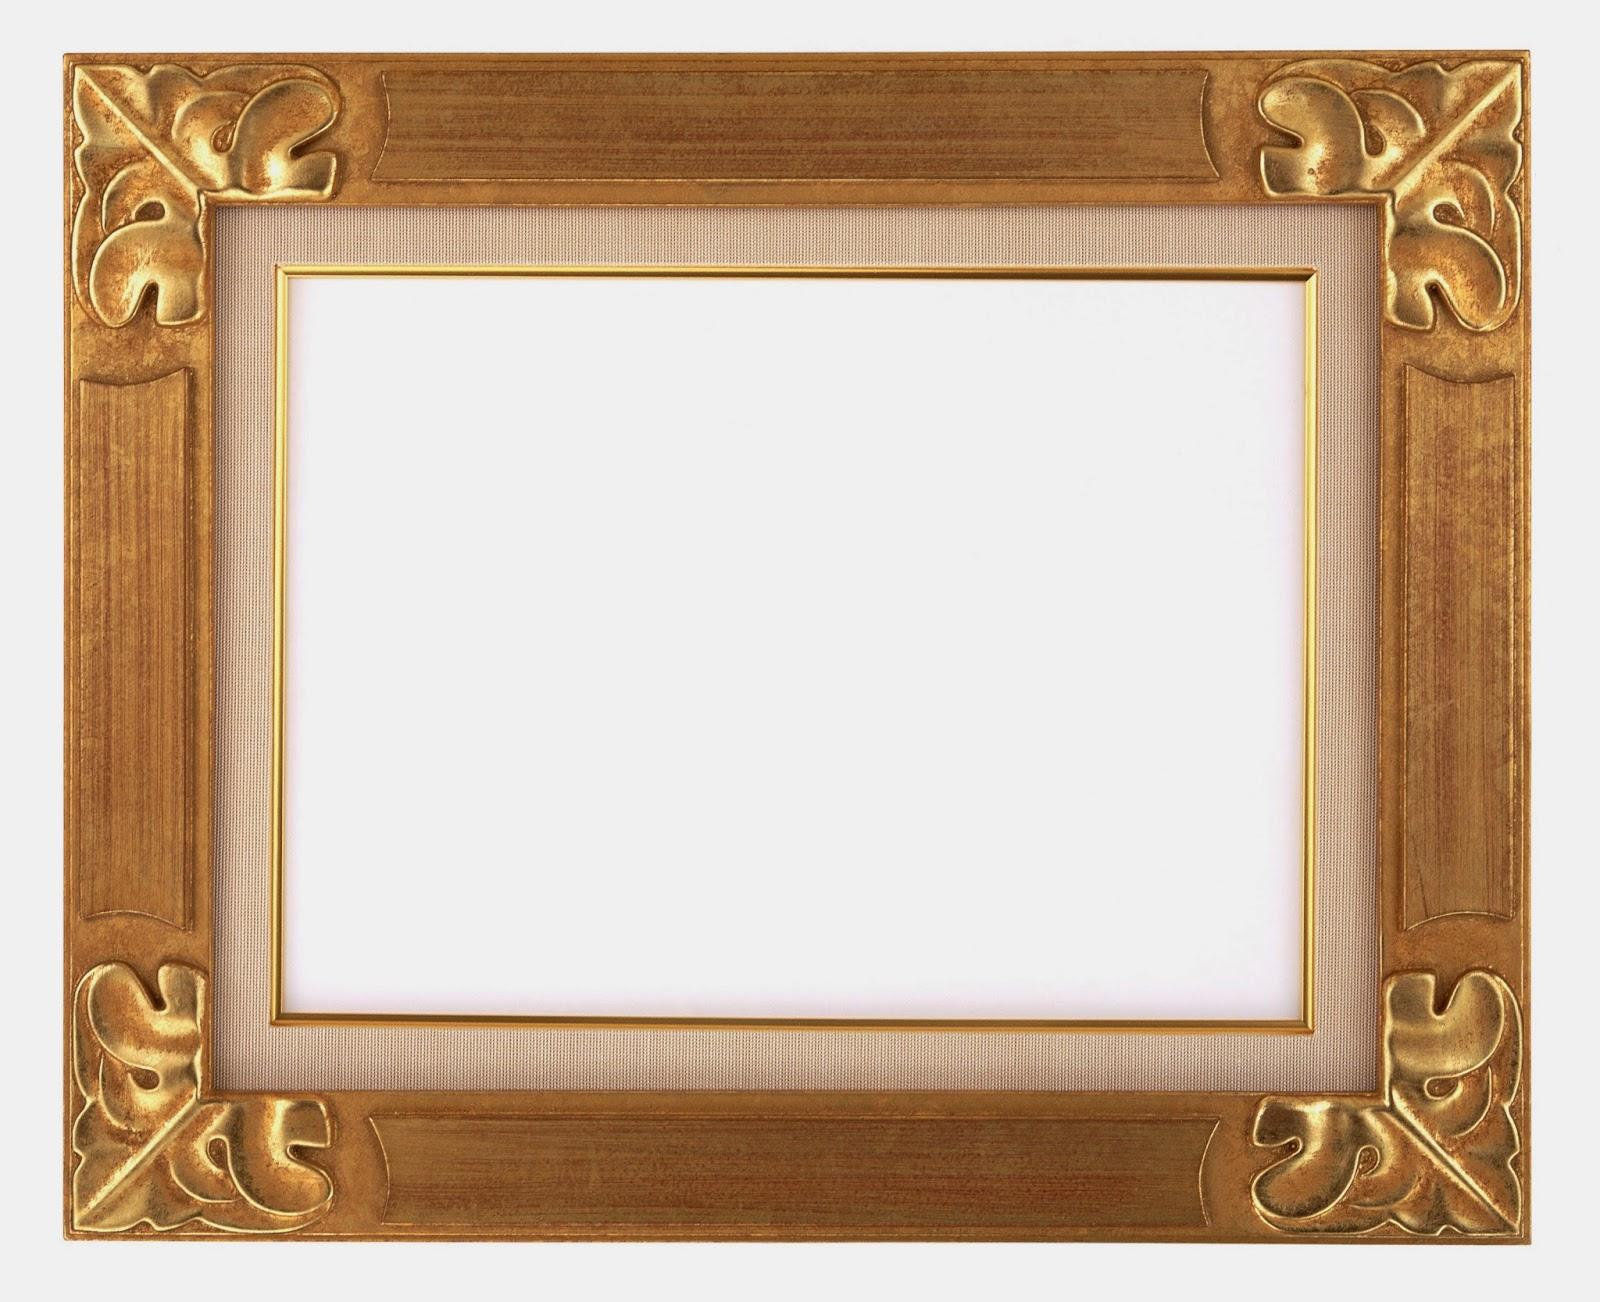 Bingkai Foto Antique Gold Frame Vector Misc Free Ikea Nyttja Hitam 25x34cm Frames Gallery Poto 1